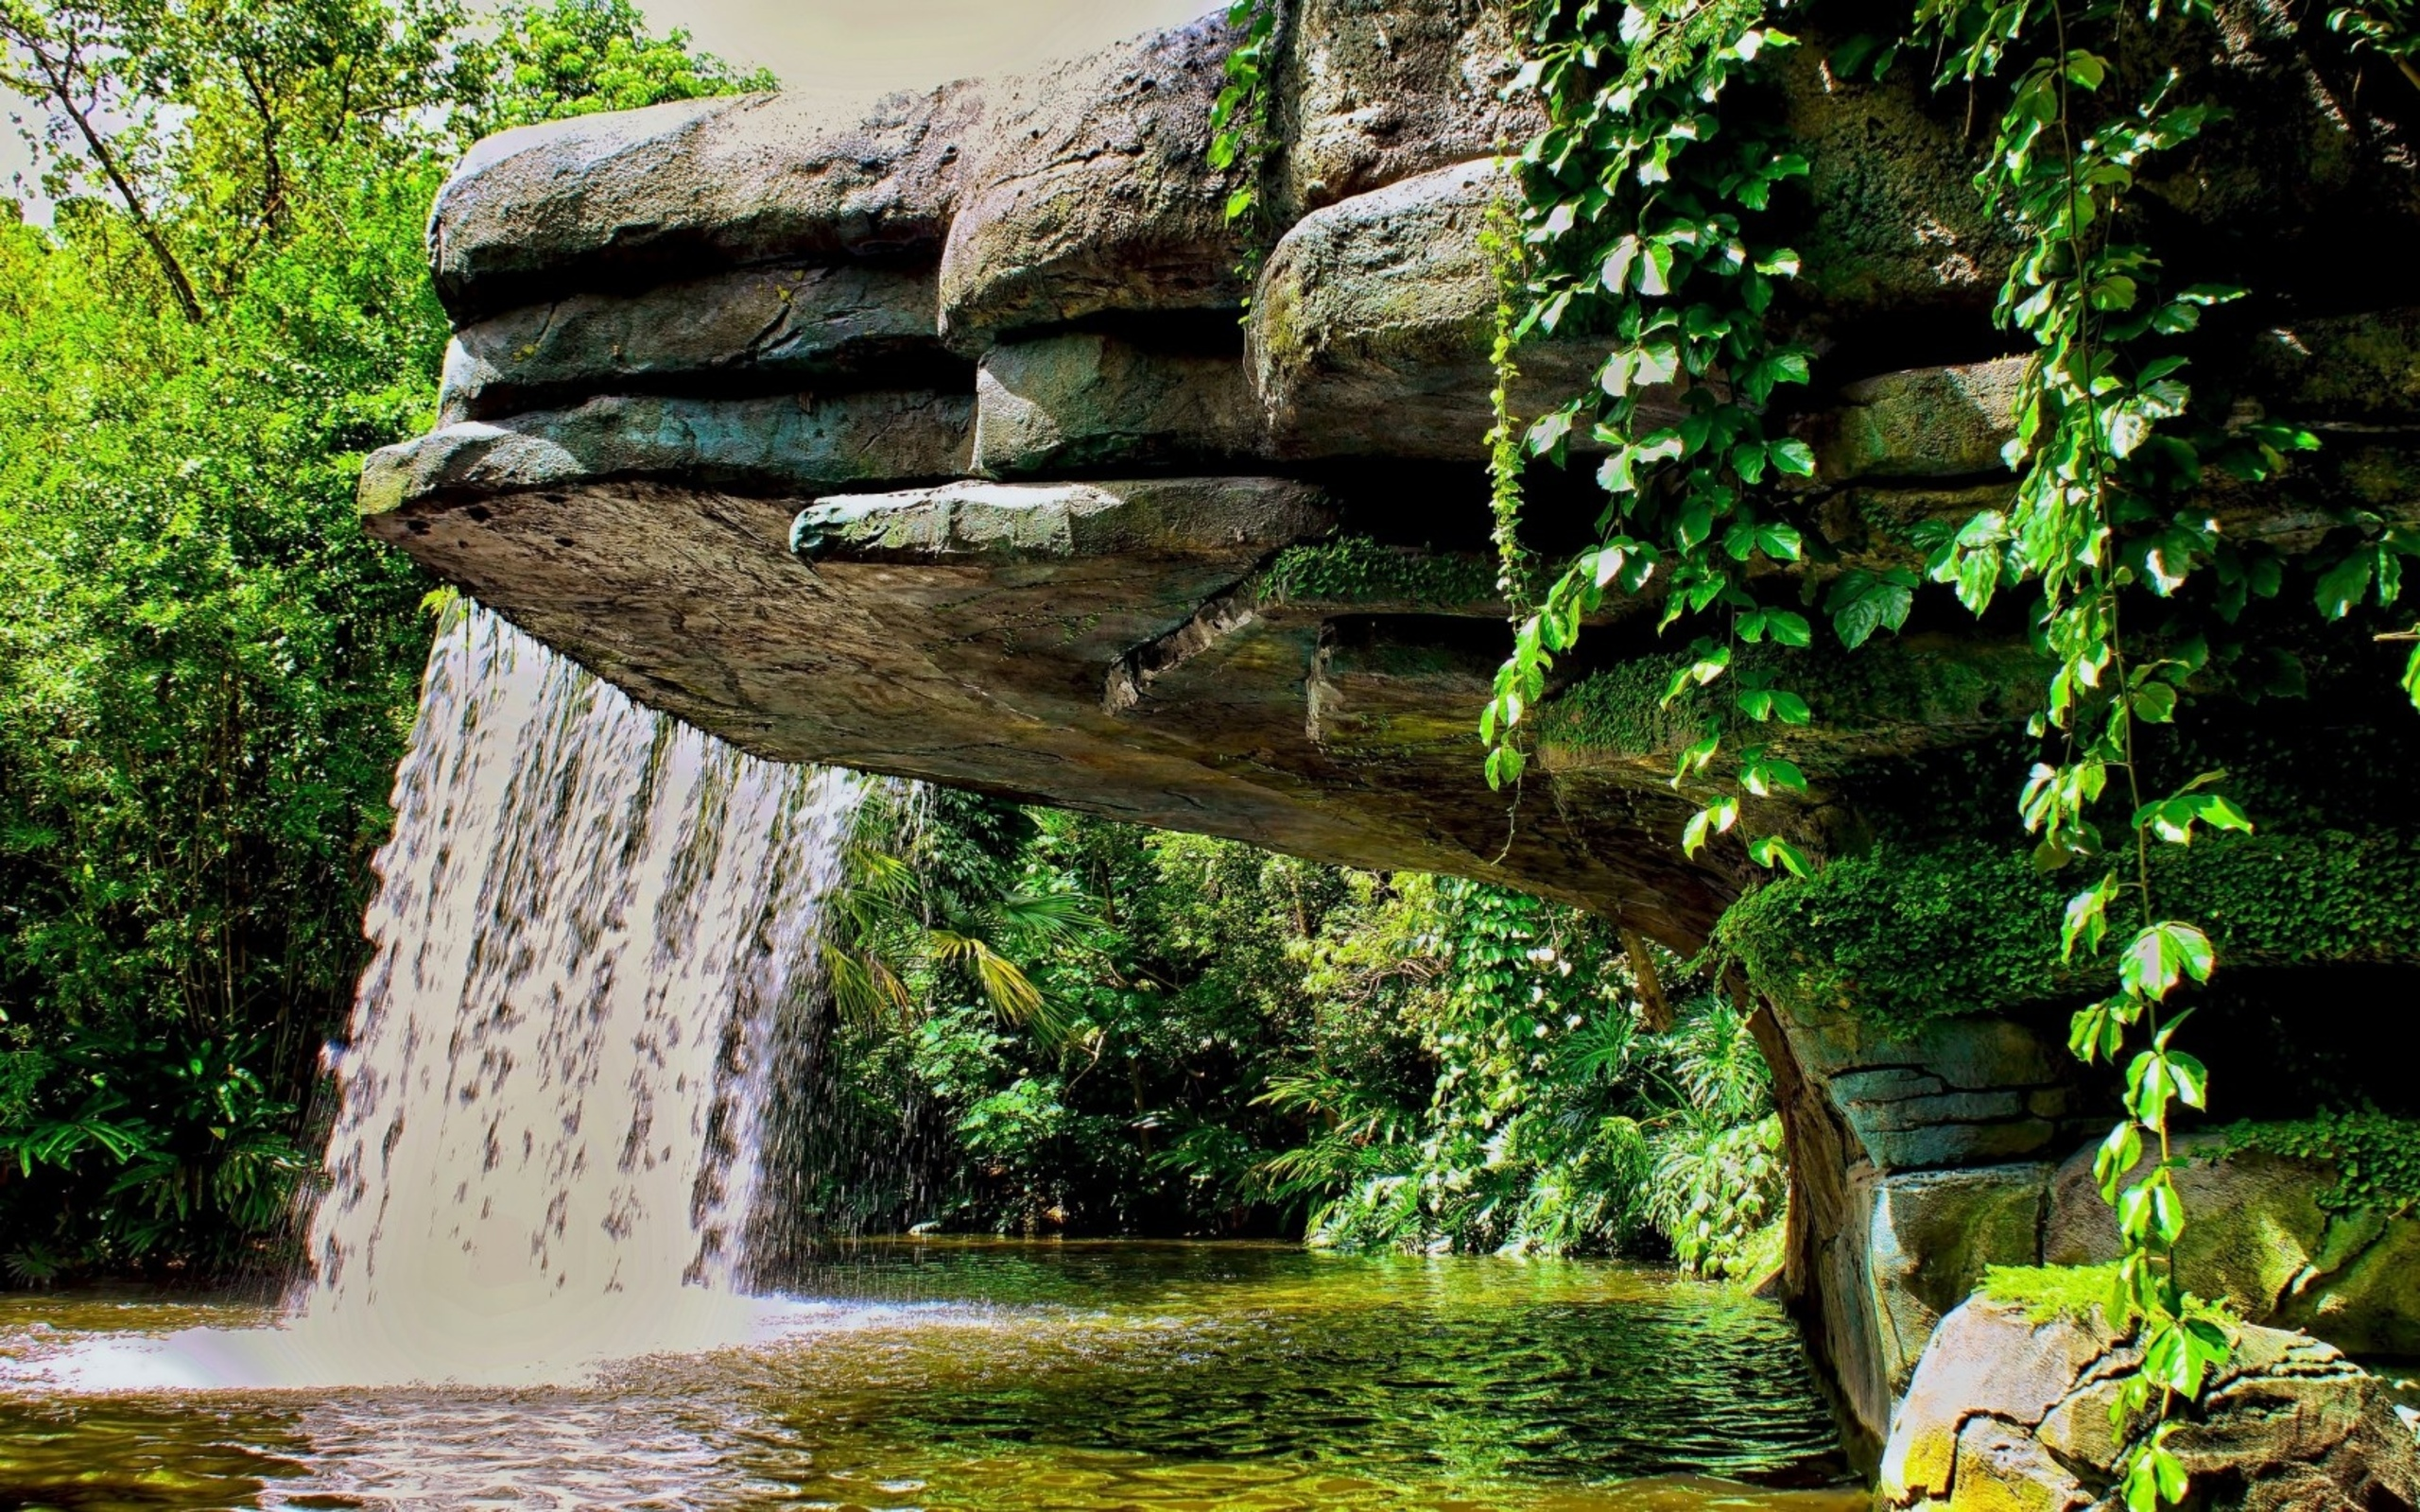 водопад озеро листья растения камни без смс